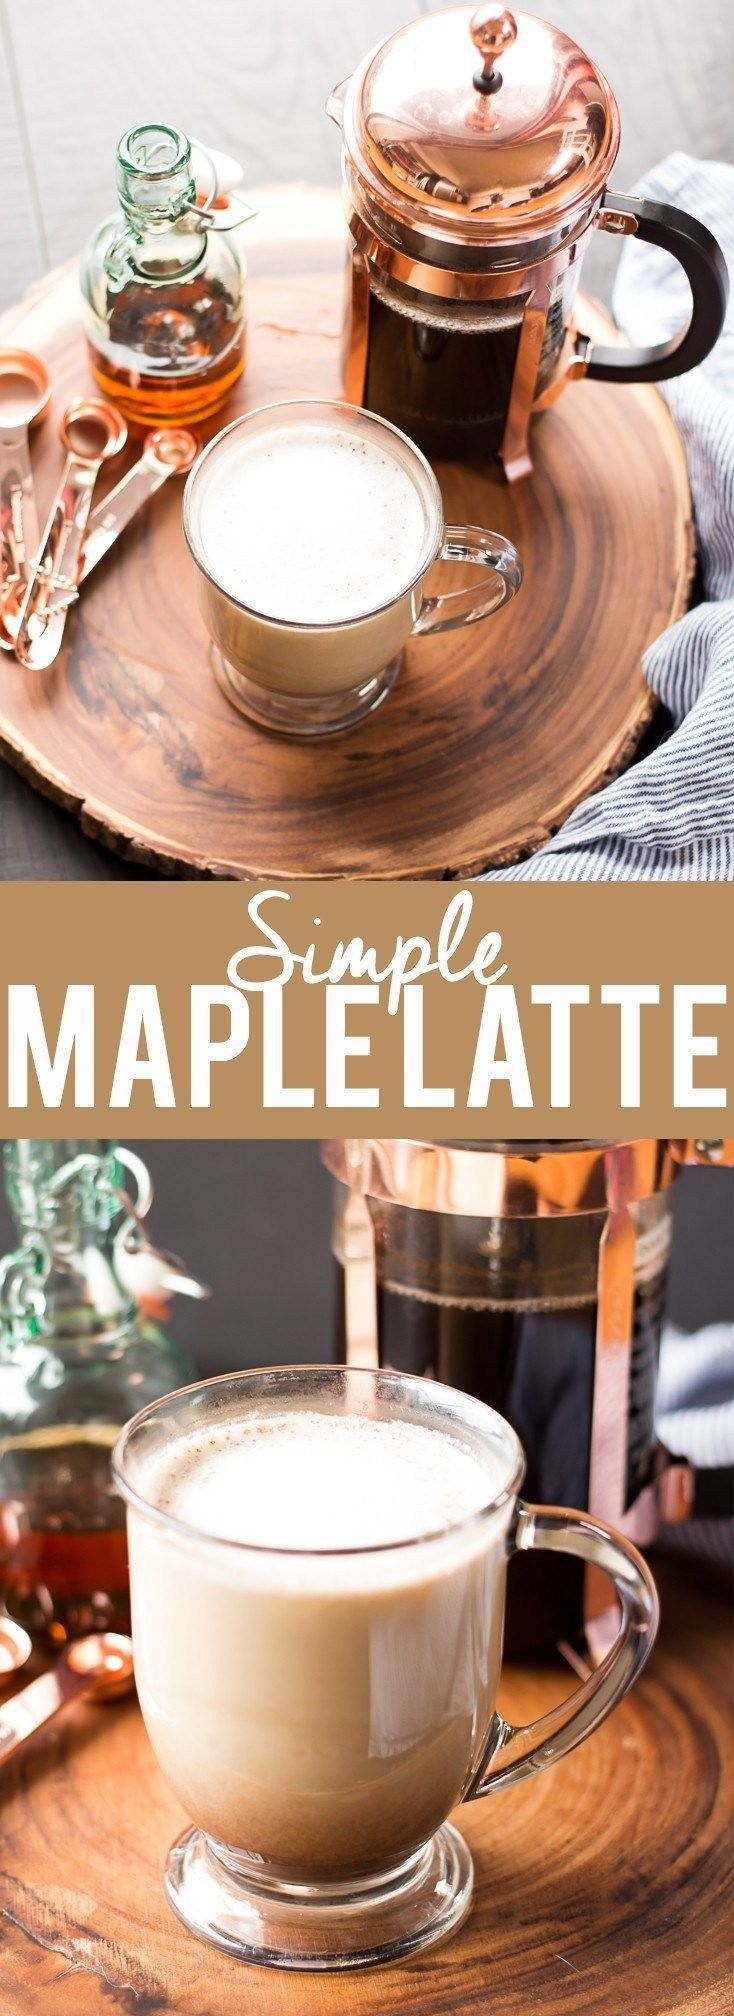 Simple Maple Latte